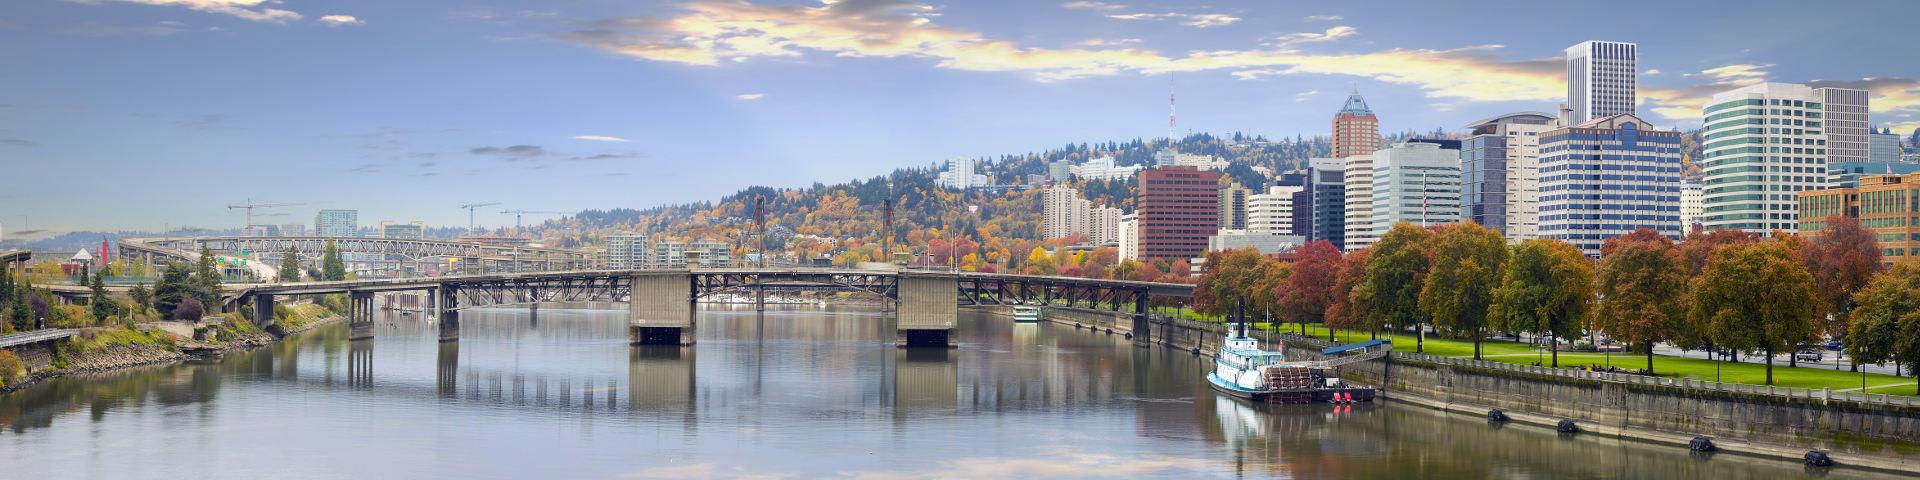 Portland hero banner 1